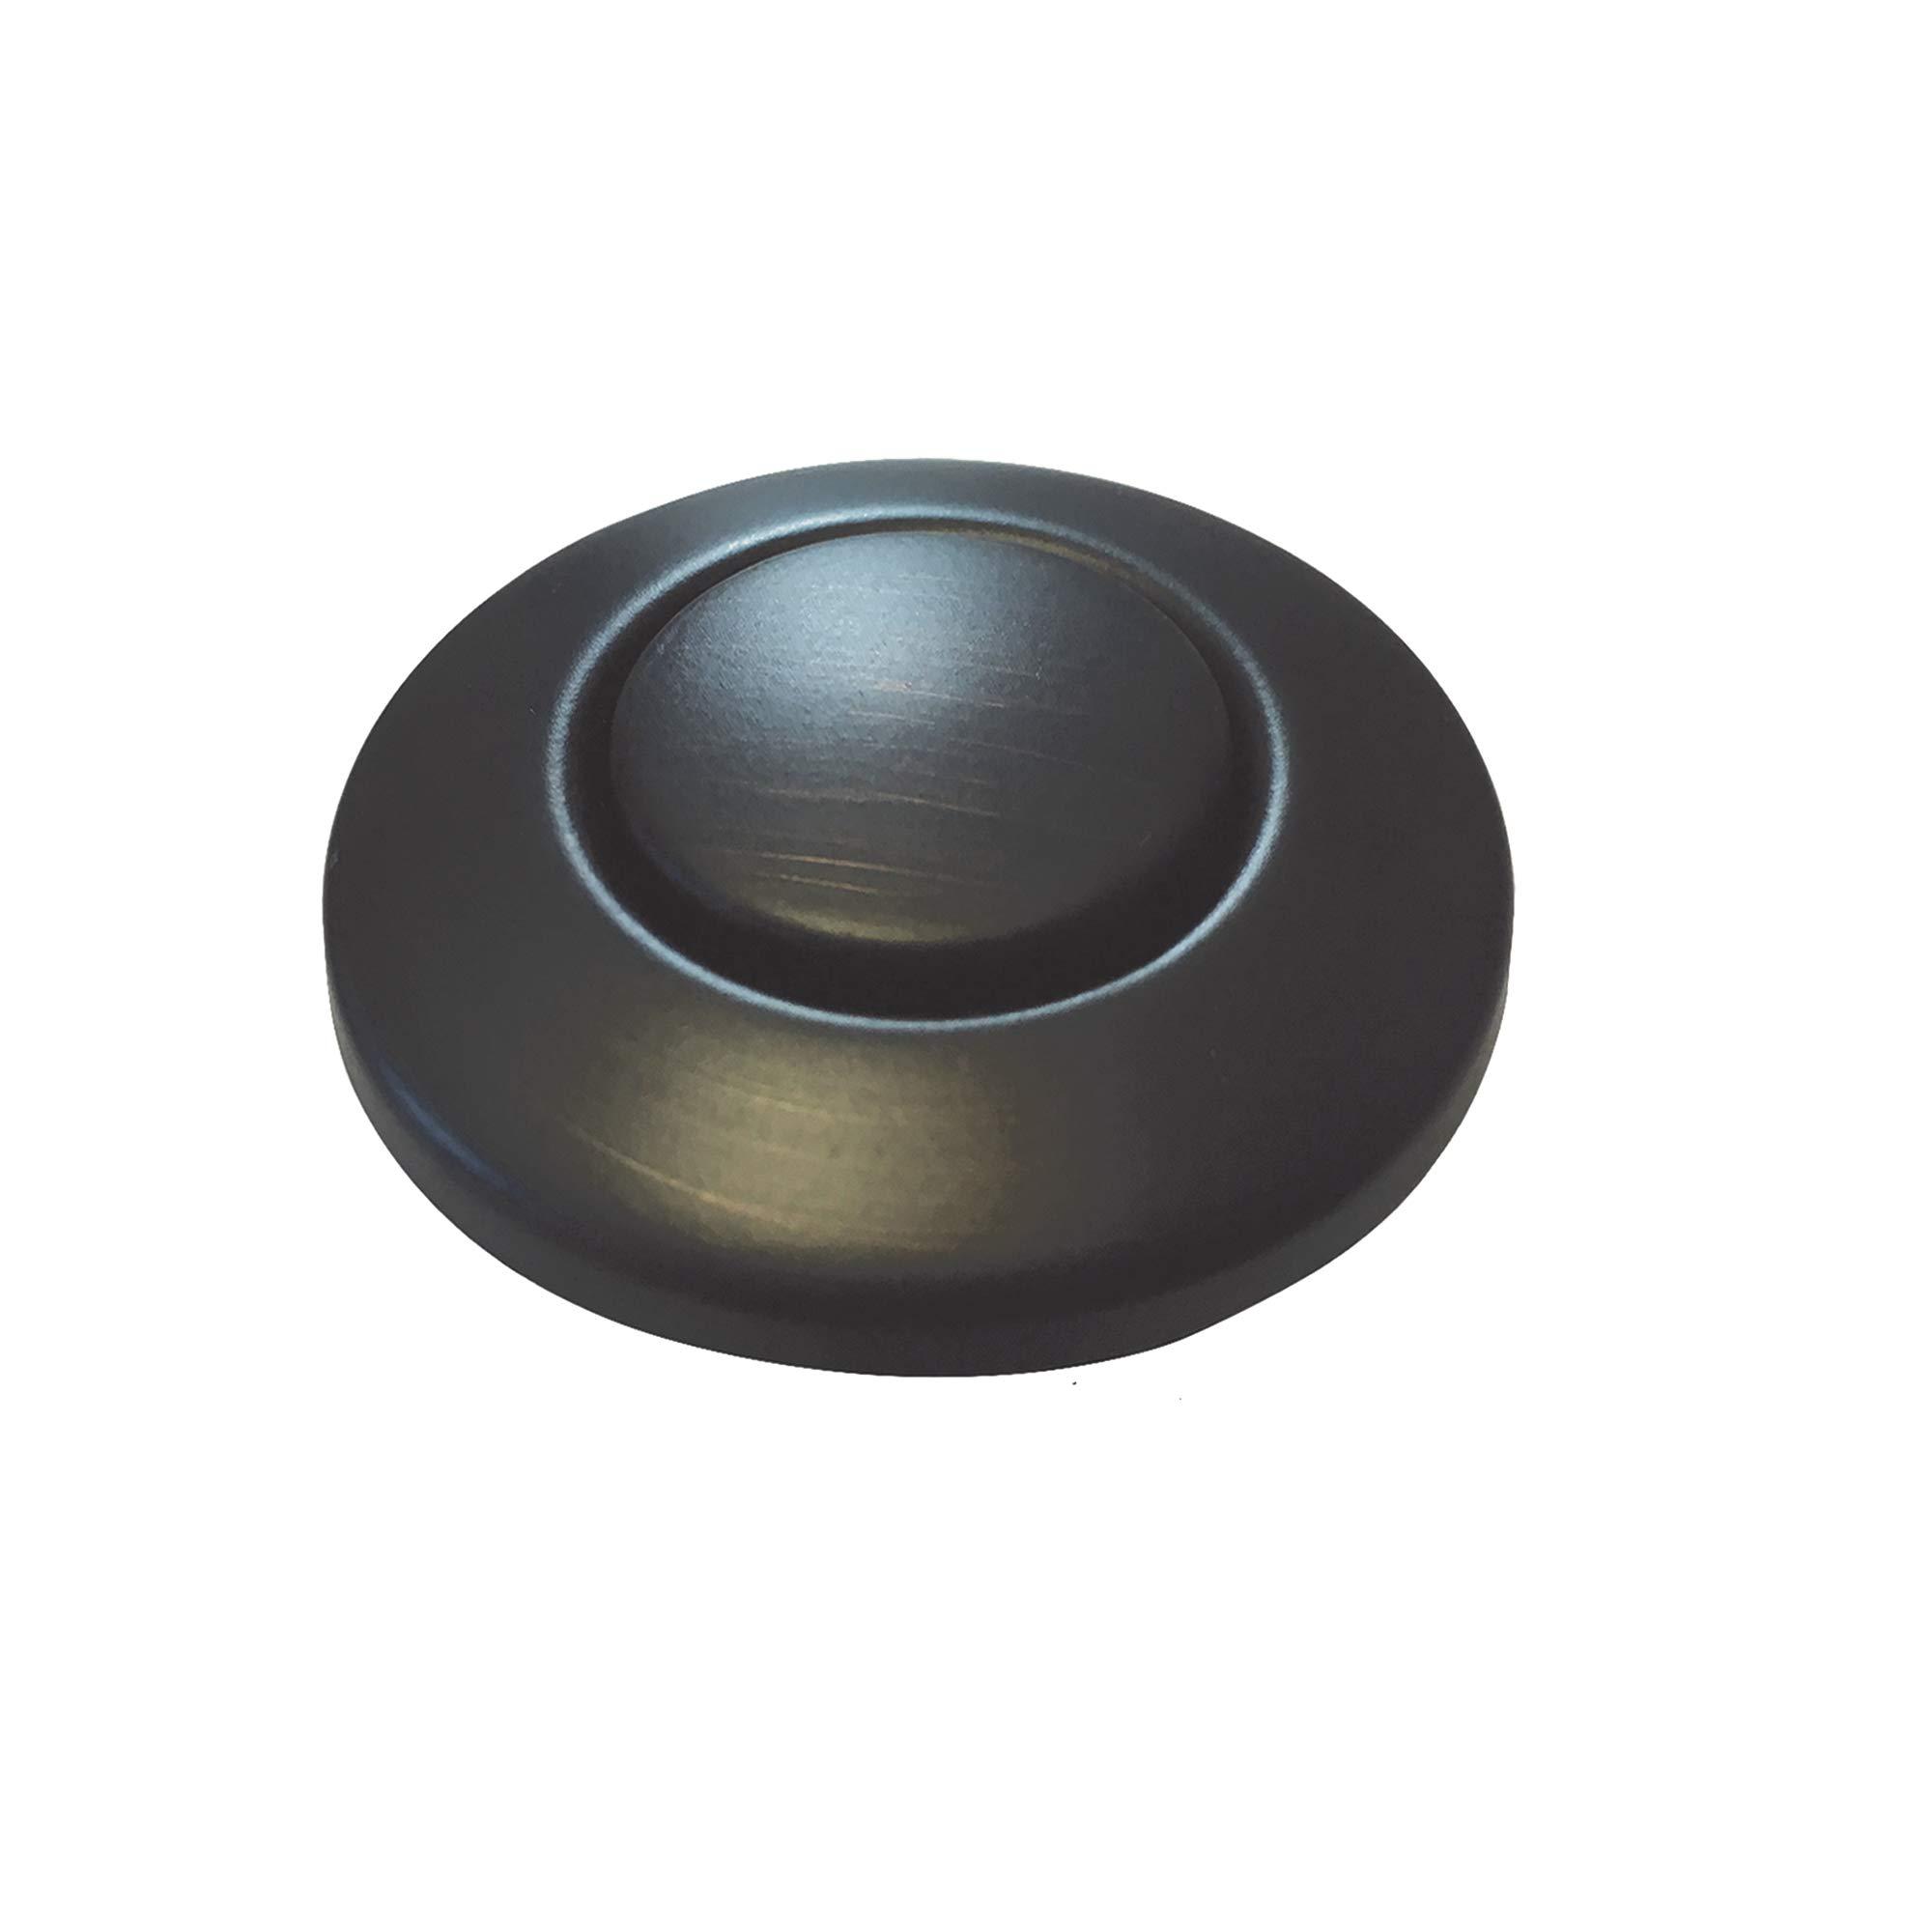 Moen AS-4201-BRB Garbage Disposal Air Switch Coordinating Decorative Button, Mediterranean Bronze by Moen